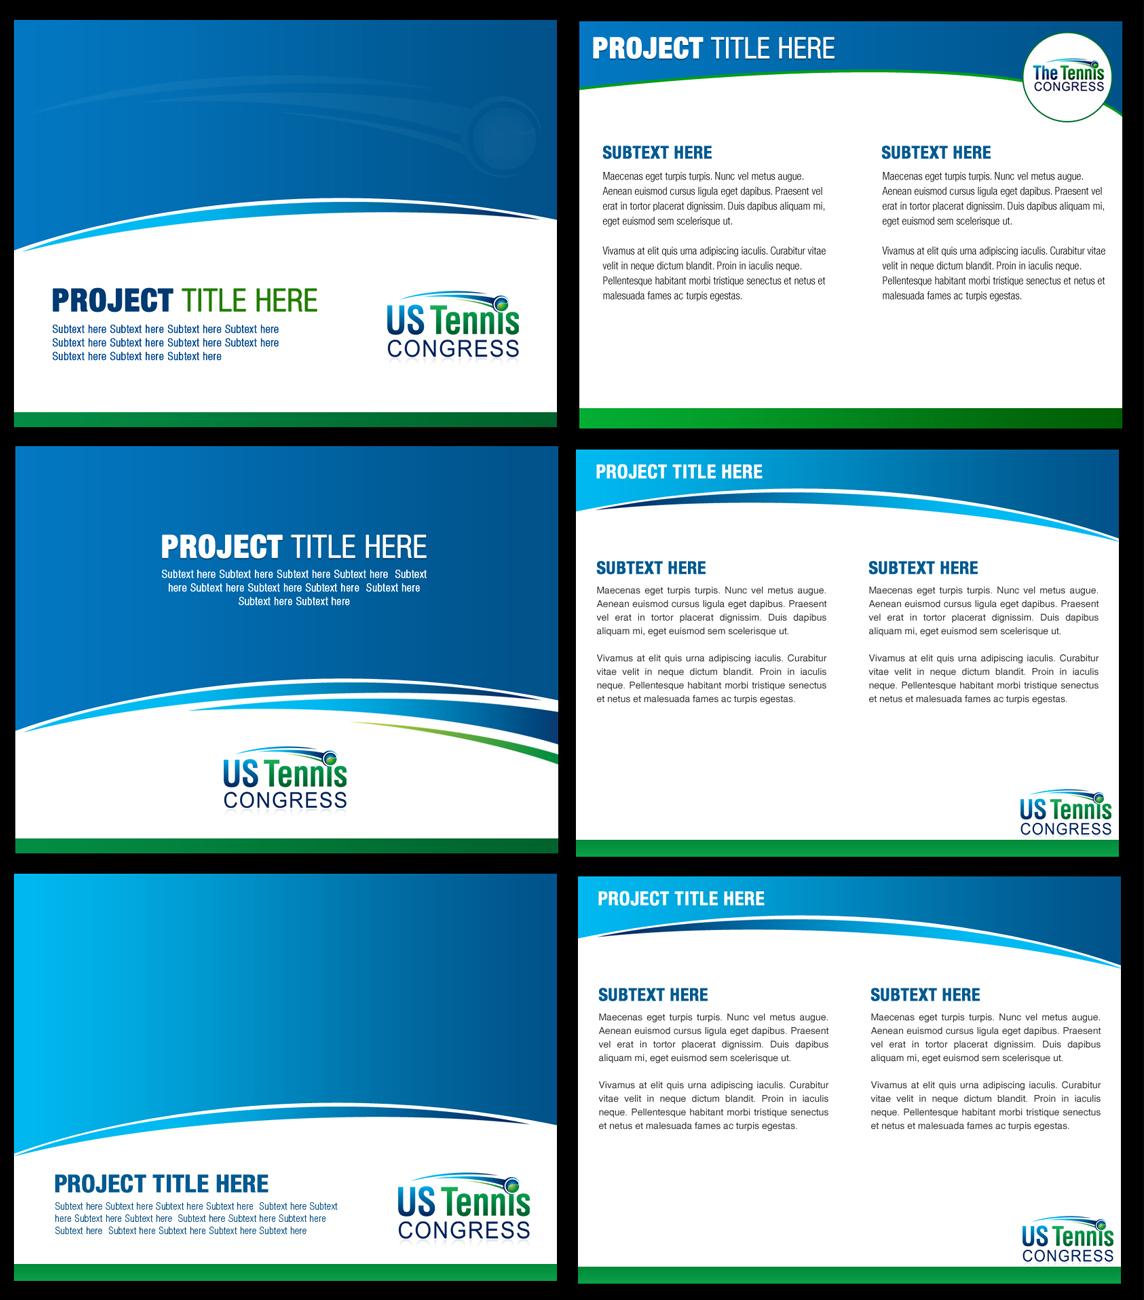 Powerpoint Design By Best Design Hub For Us Tennis Congress   Design  #3839801